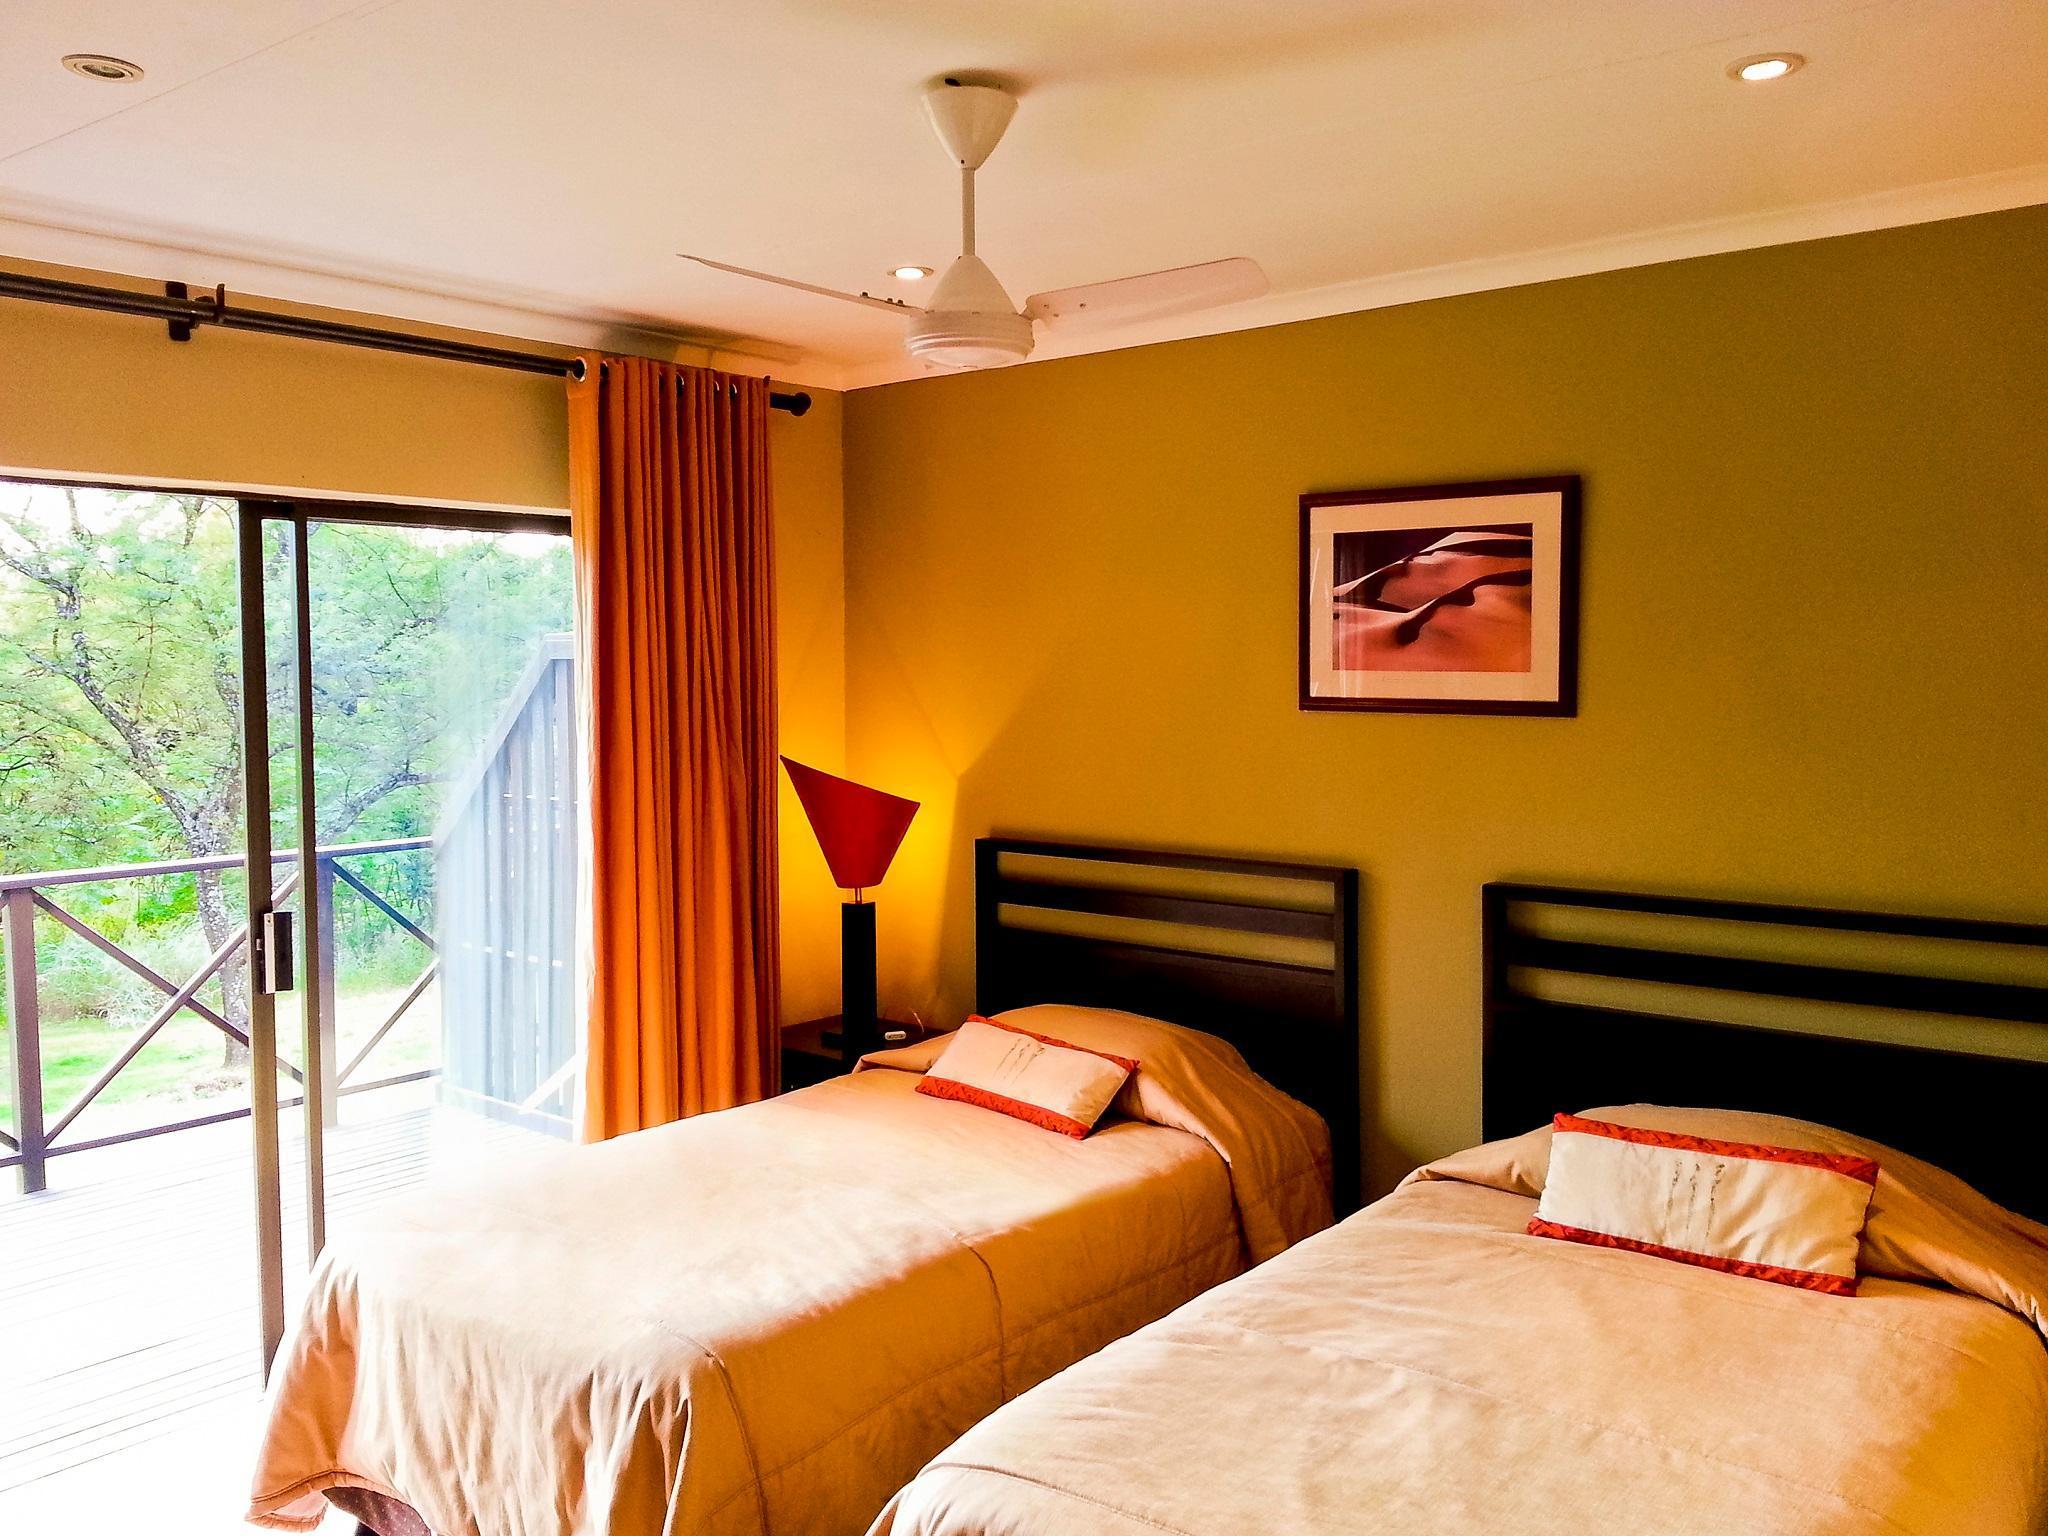 The Venue Country Hotel, Bojanala